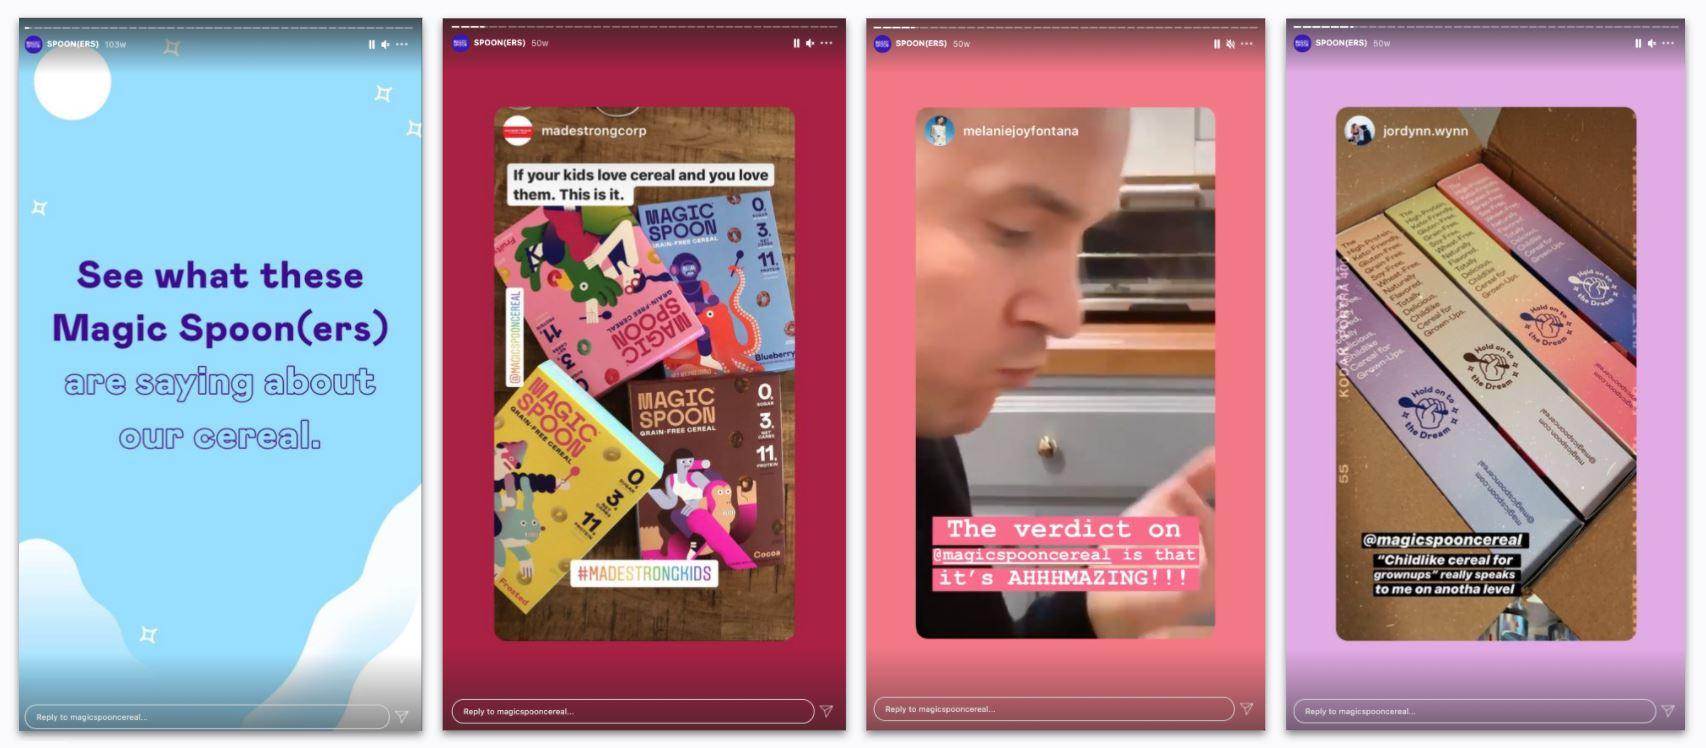 Magic Spoon - Instagram User-Generated Content via IG Stories